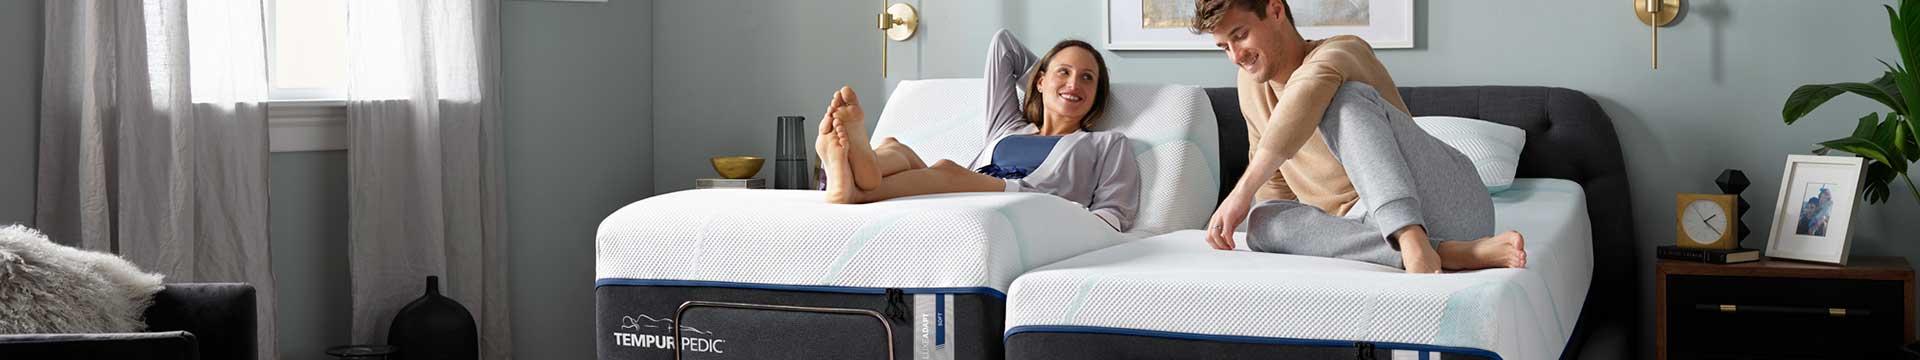 Man and women on a king mattress dual adjustable Tempur-Pedic